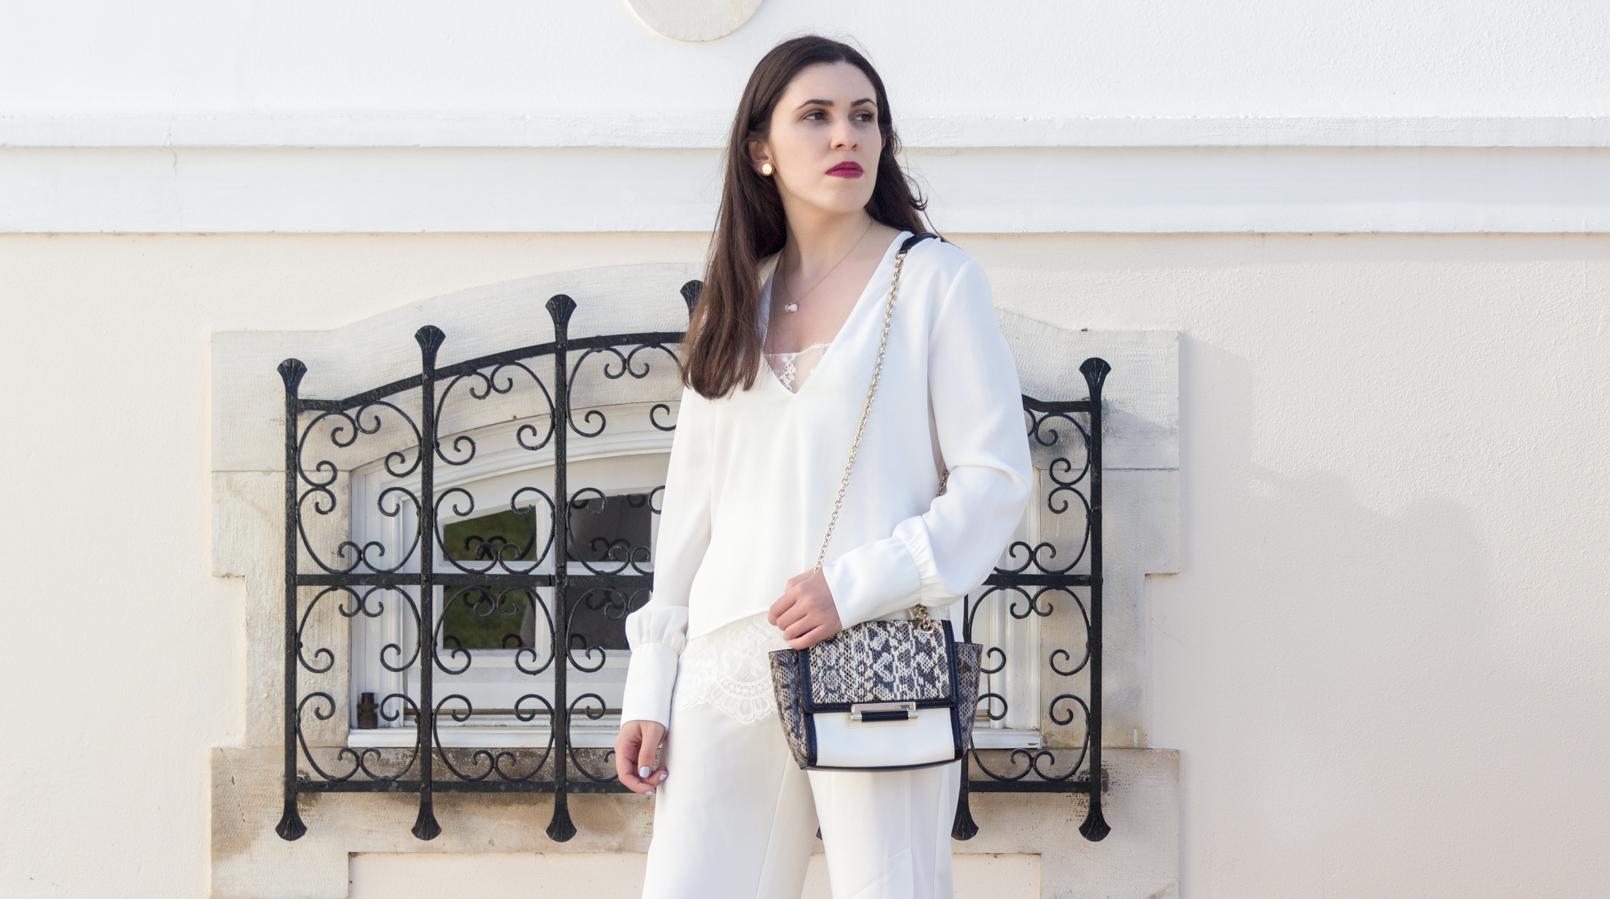 Le Fashionaire Where to shop for discount designer bags? white lace zara blouse diane von furstenberg leather snake gold chain white bag white quartz hm necklace bulgari white gold earrings 5614F EN